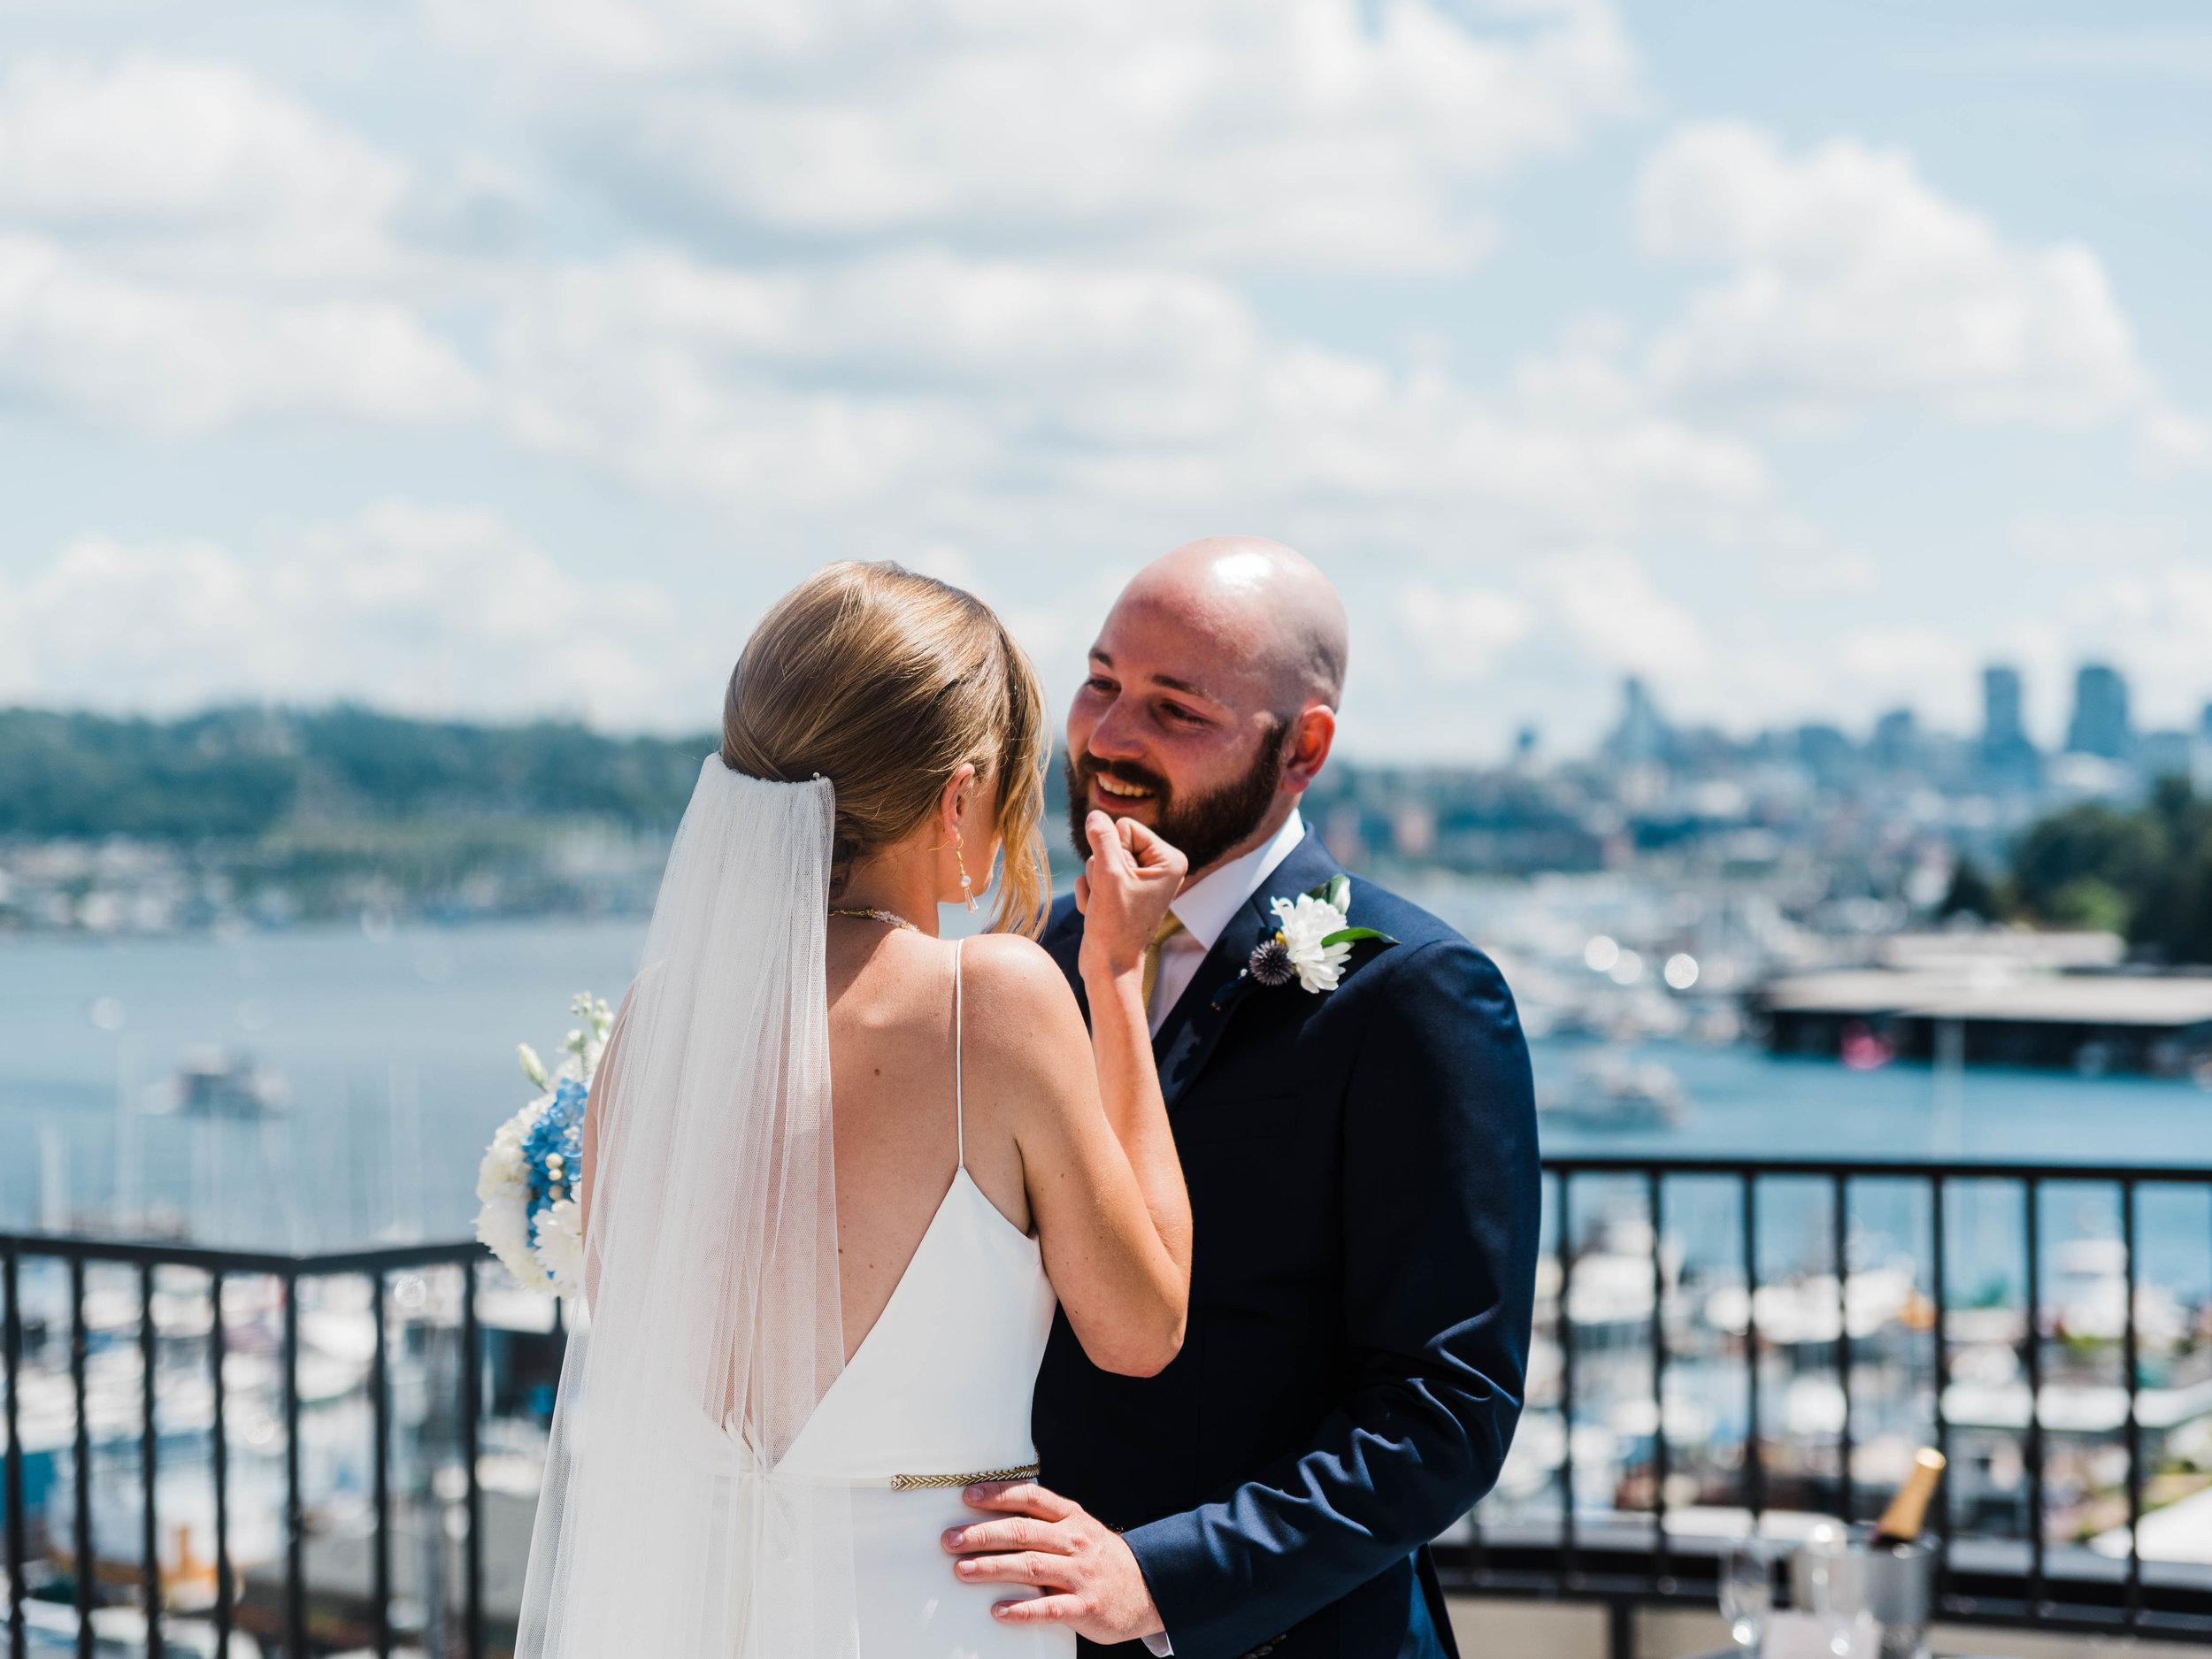 Seattle Wedding- MV Skansonia - Anna + Josh -  (355).jpg